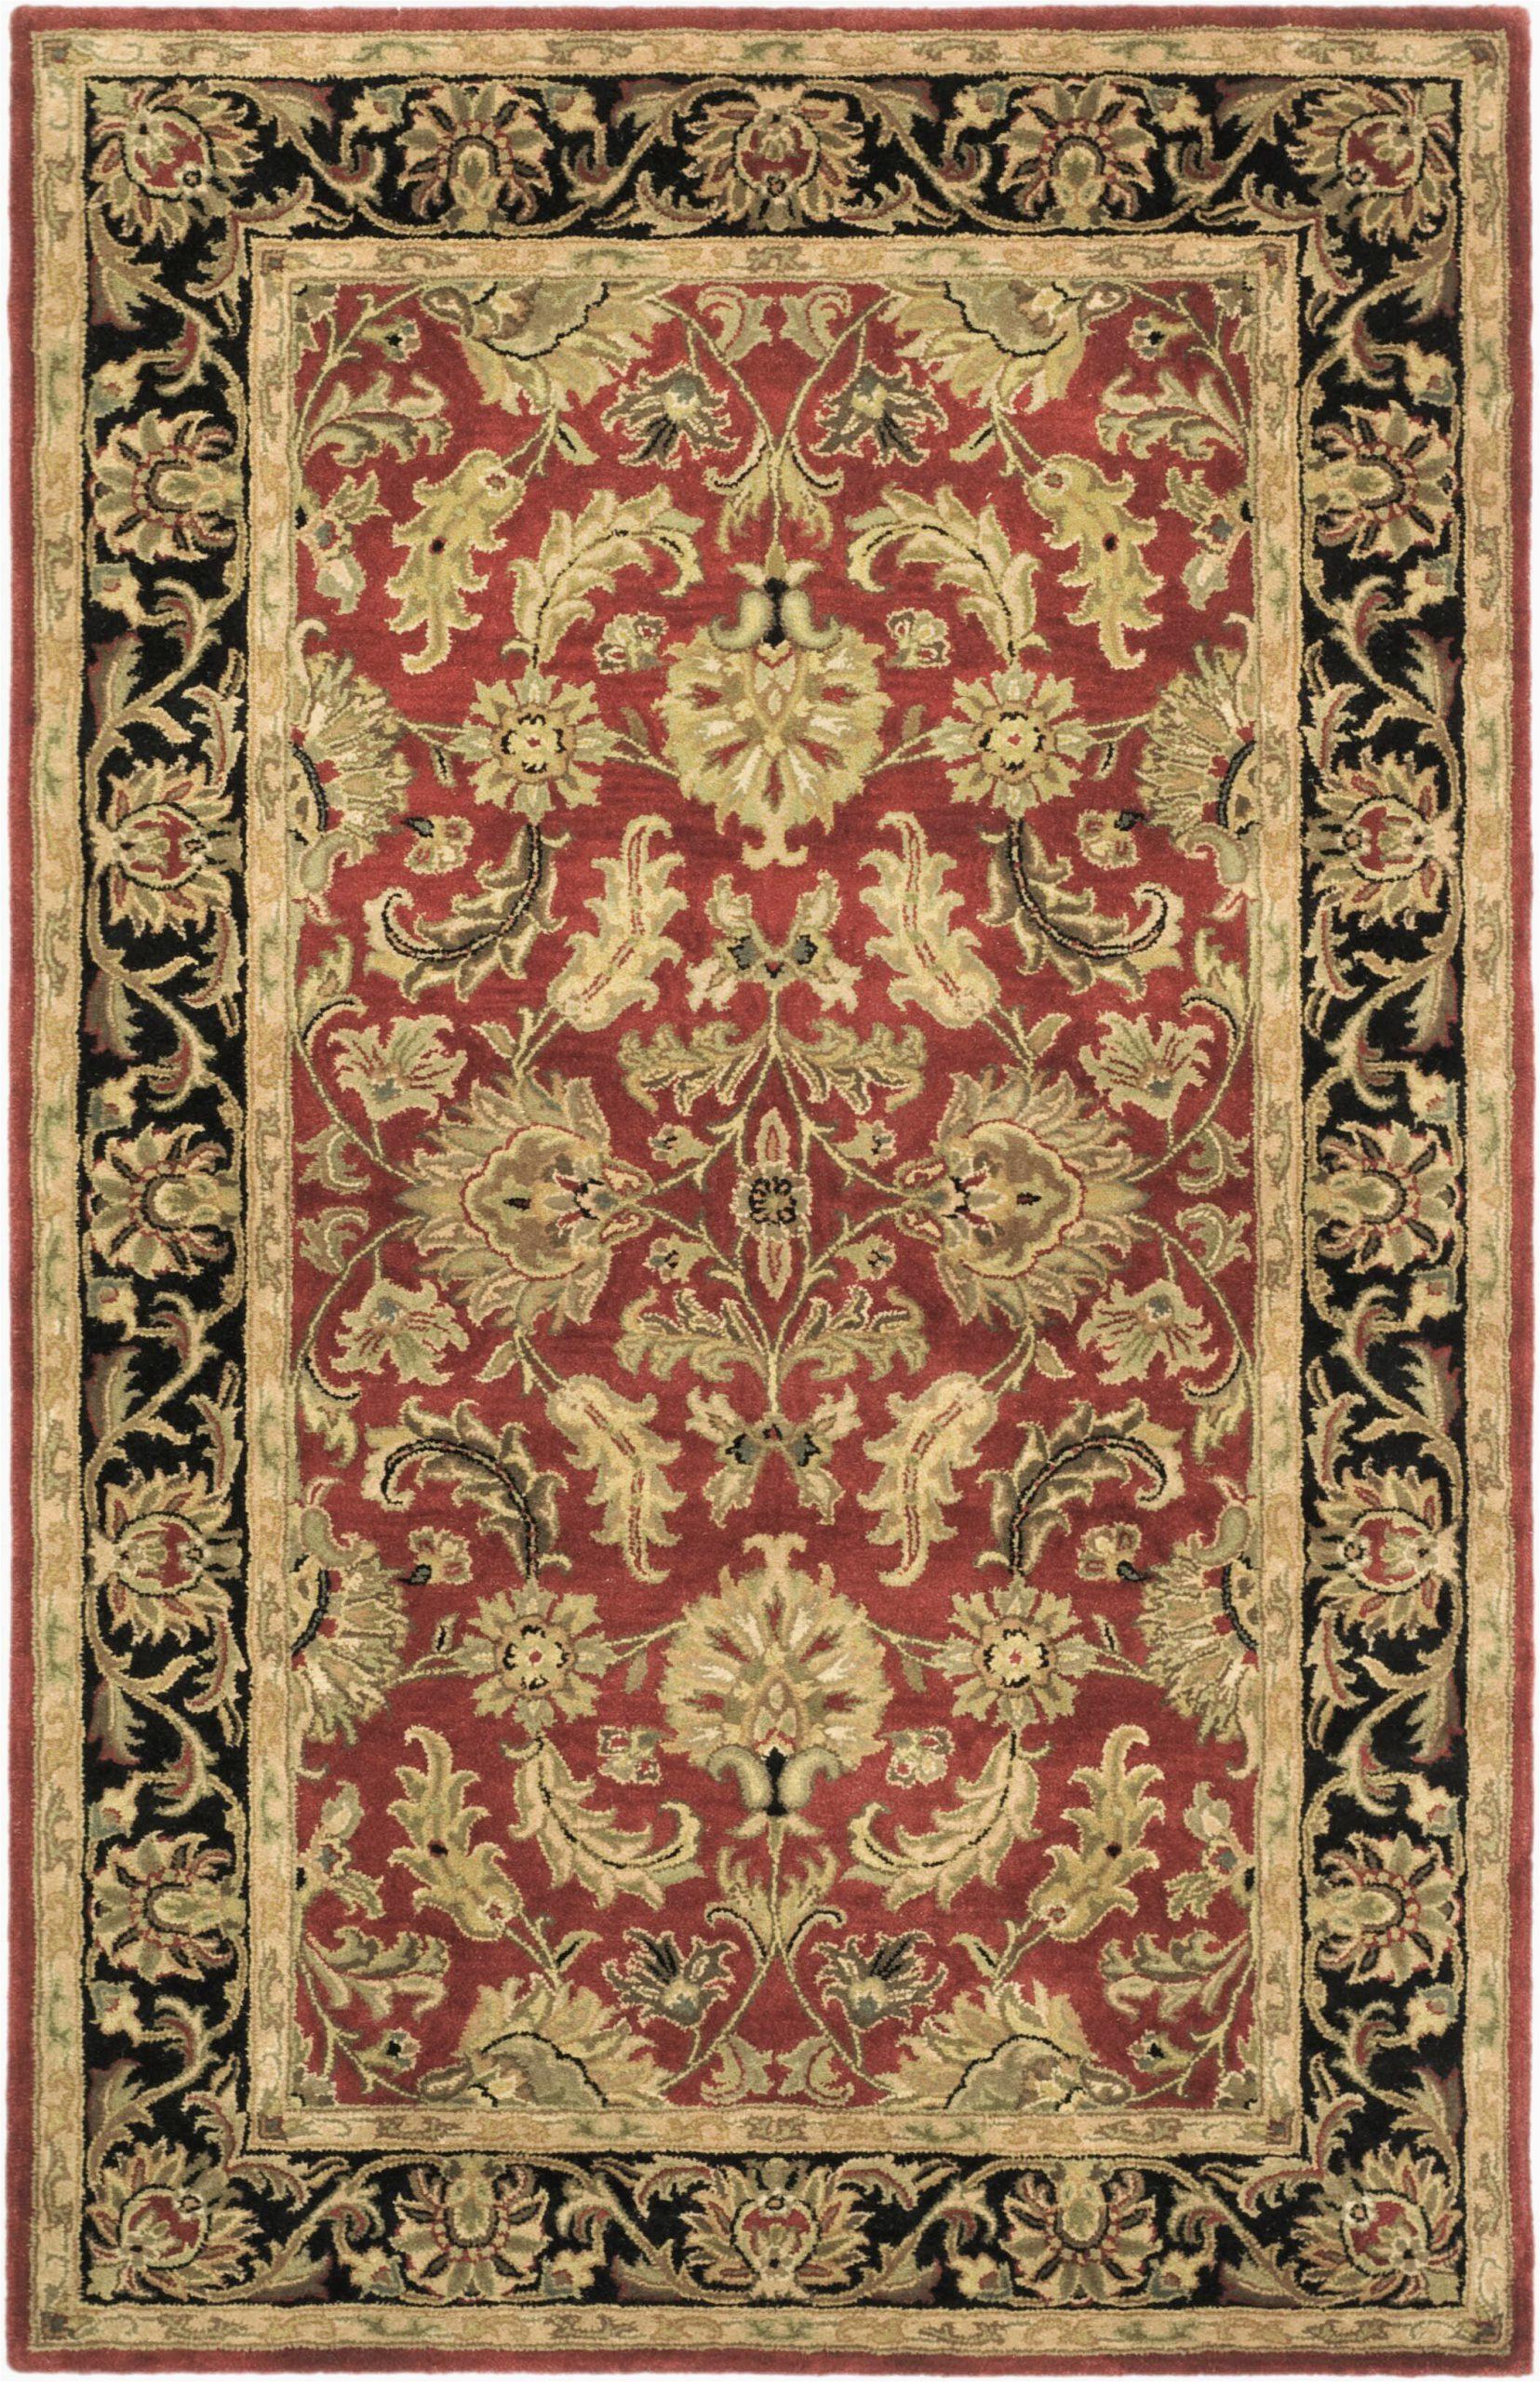 cranmore handmade tufted wool redblack rug